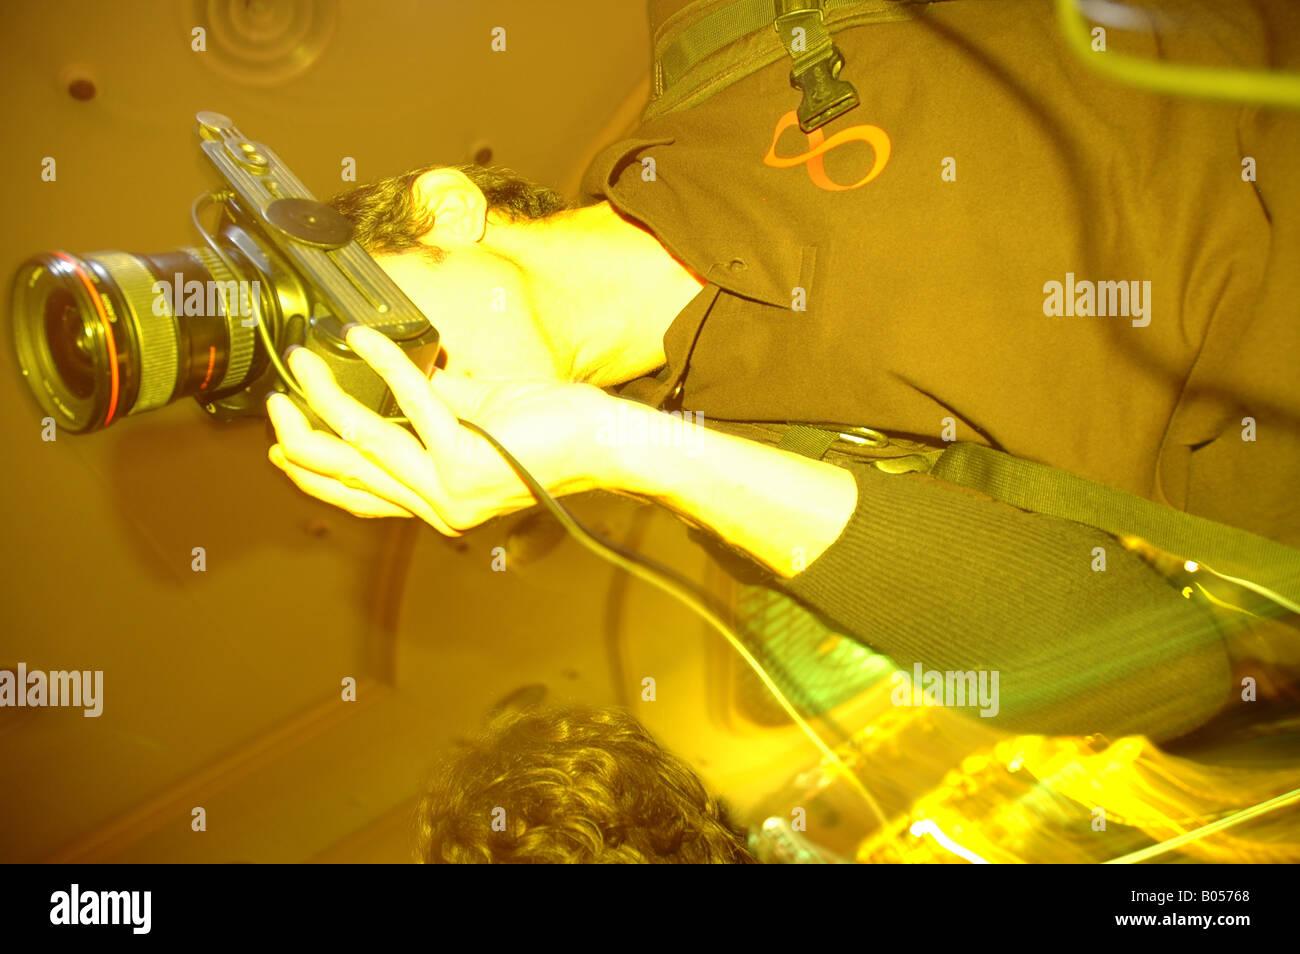 Farbblitz colorflash Fotografieren photoshooting Bewegungsunschärfe blurred motion Mann man - Stock Image